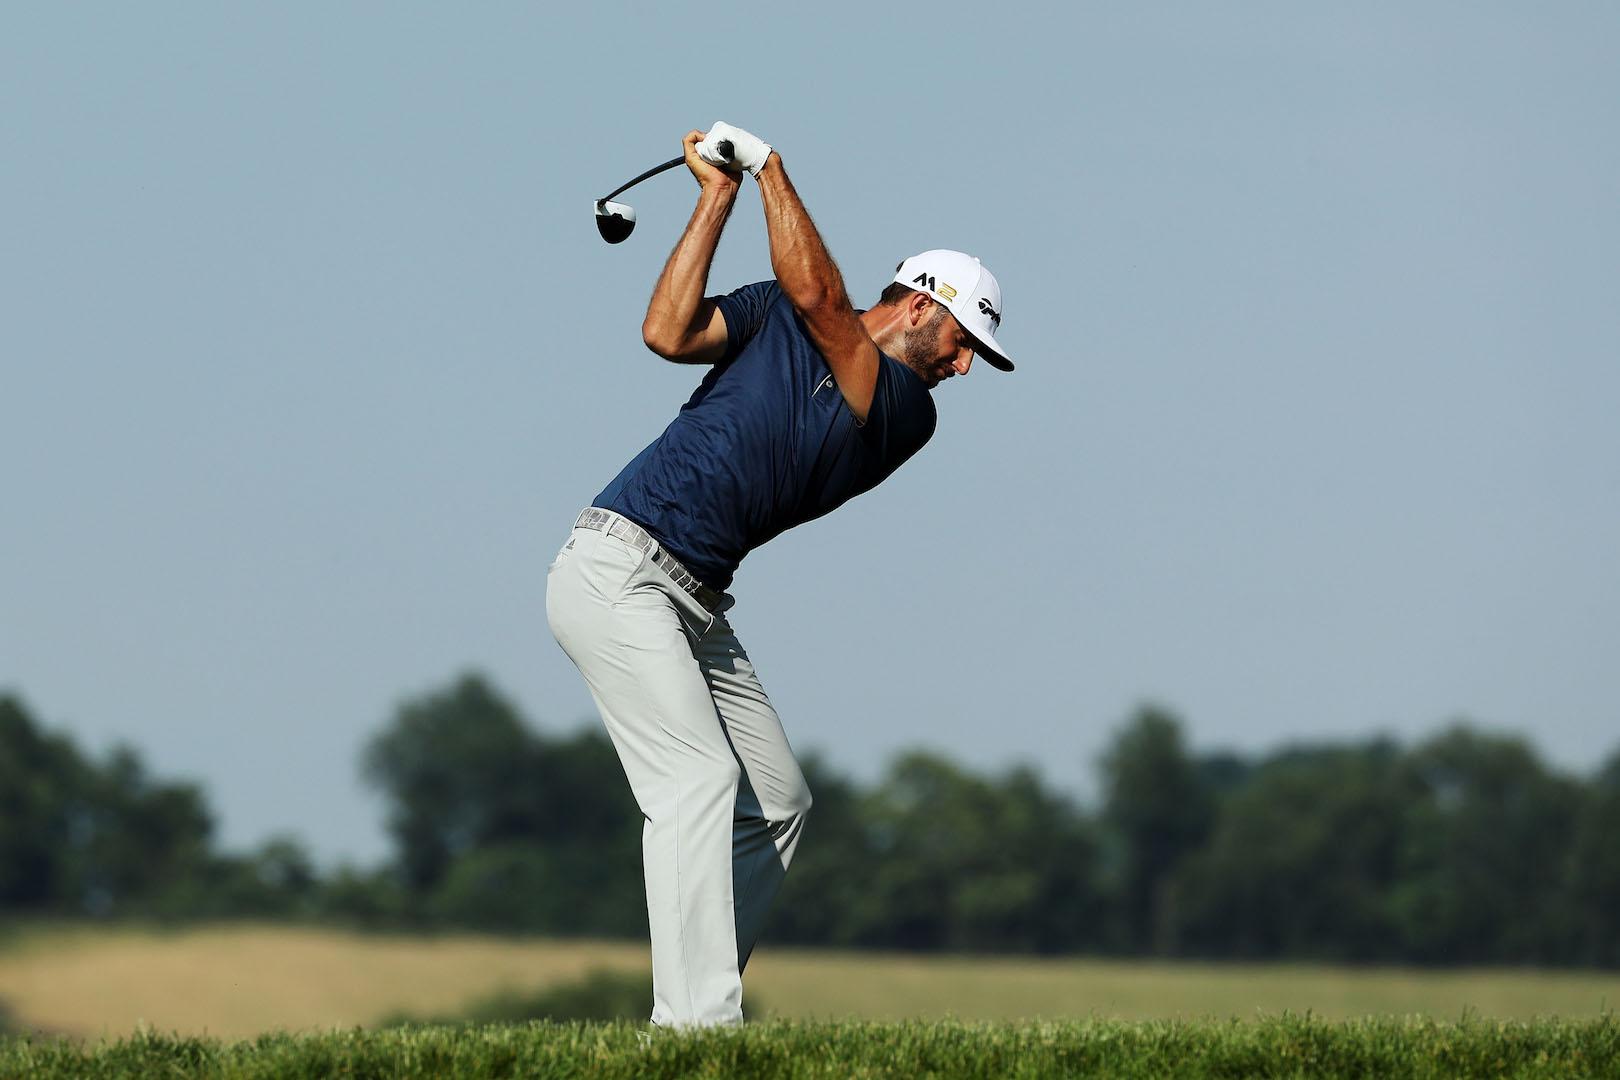 Dustin Johnson Wins the U.S. Open